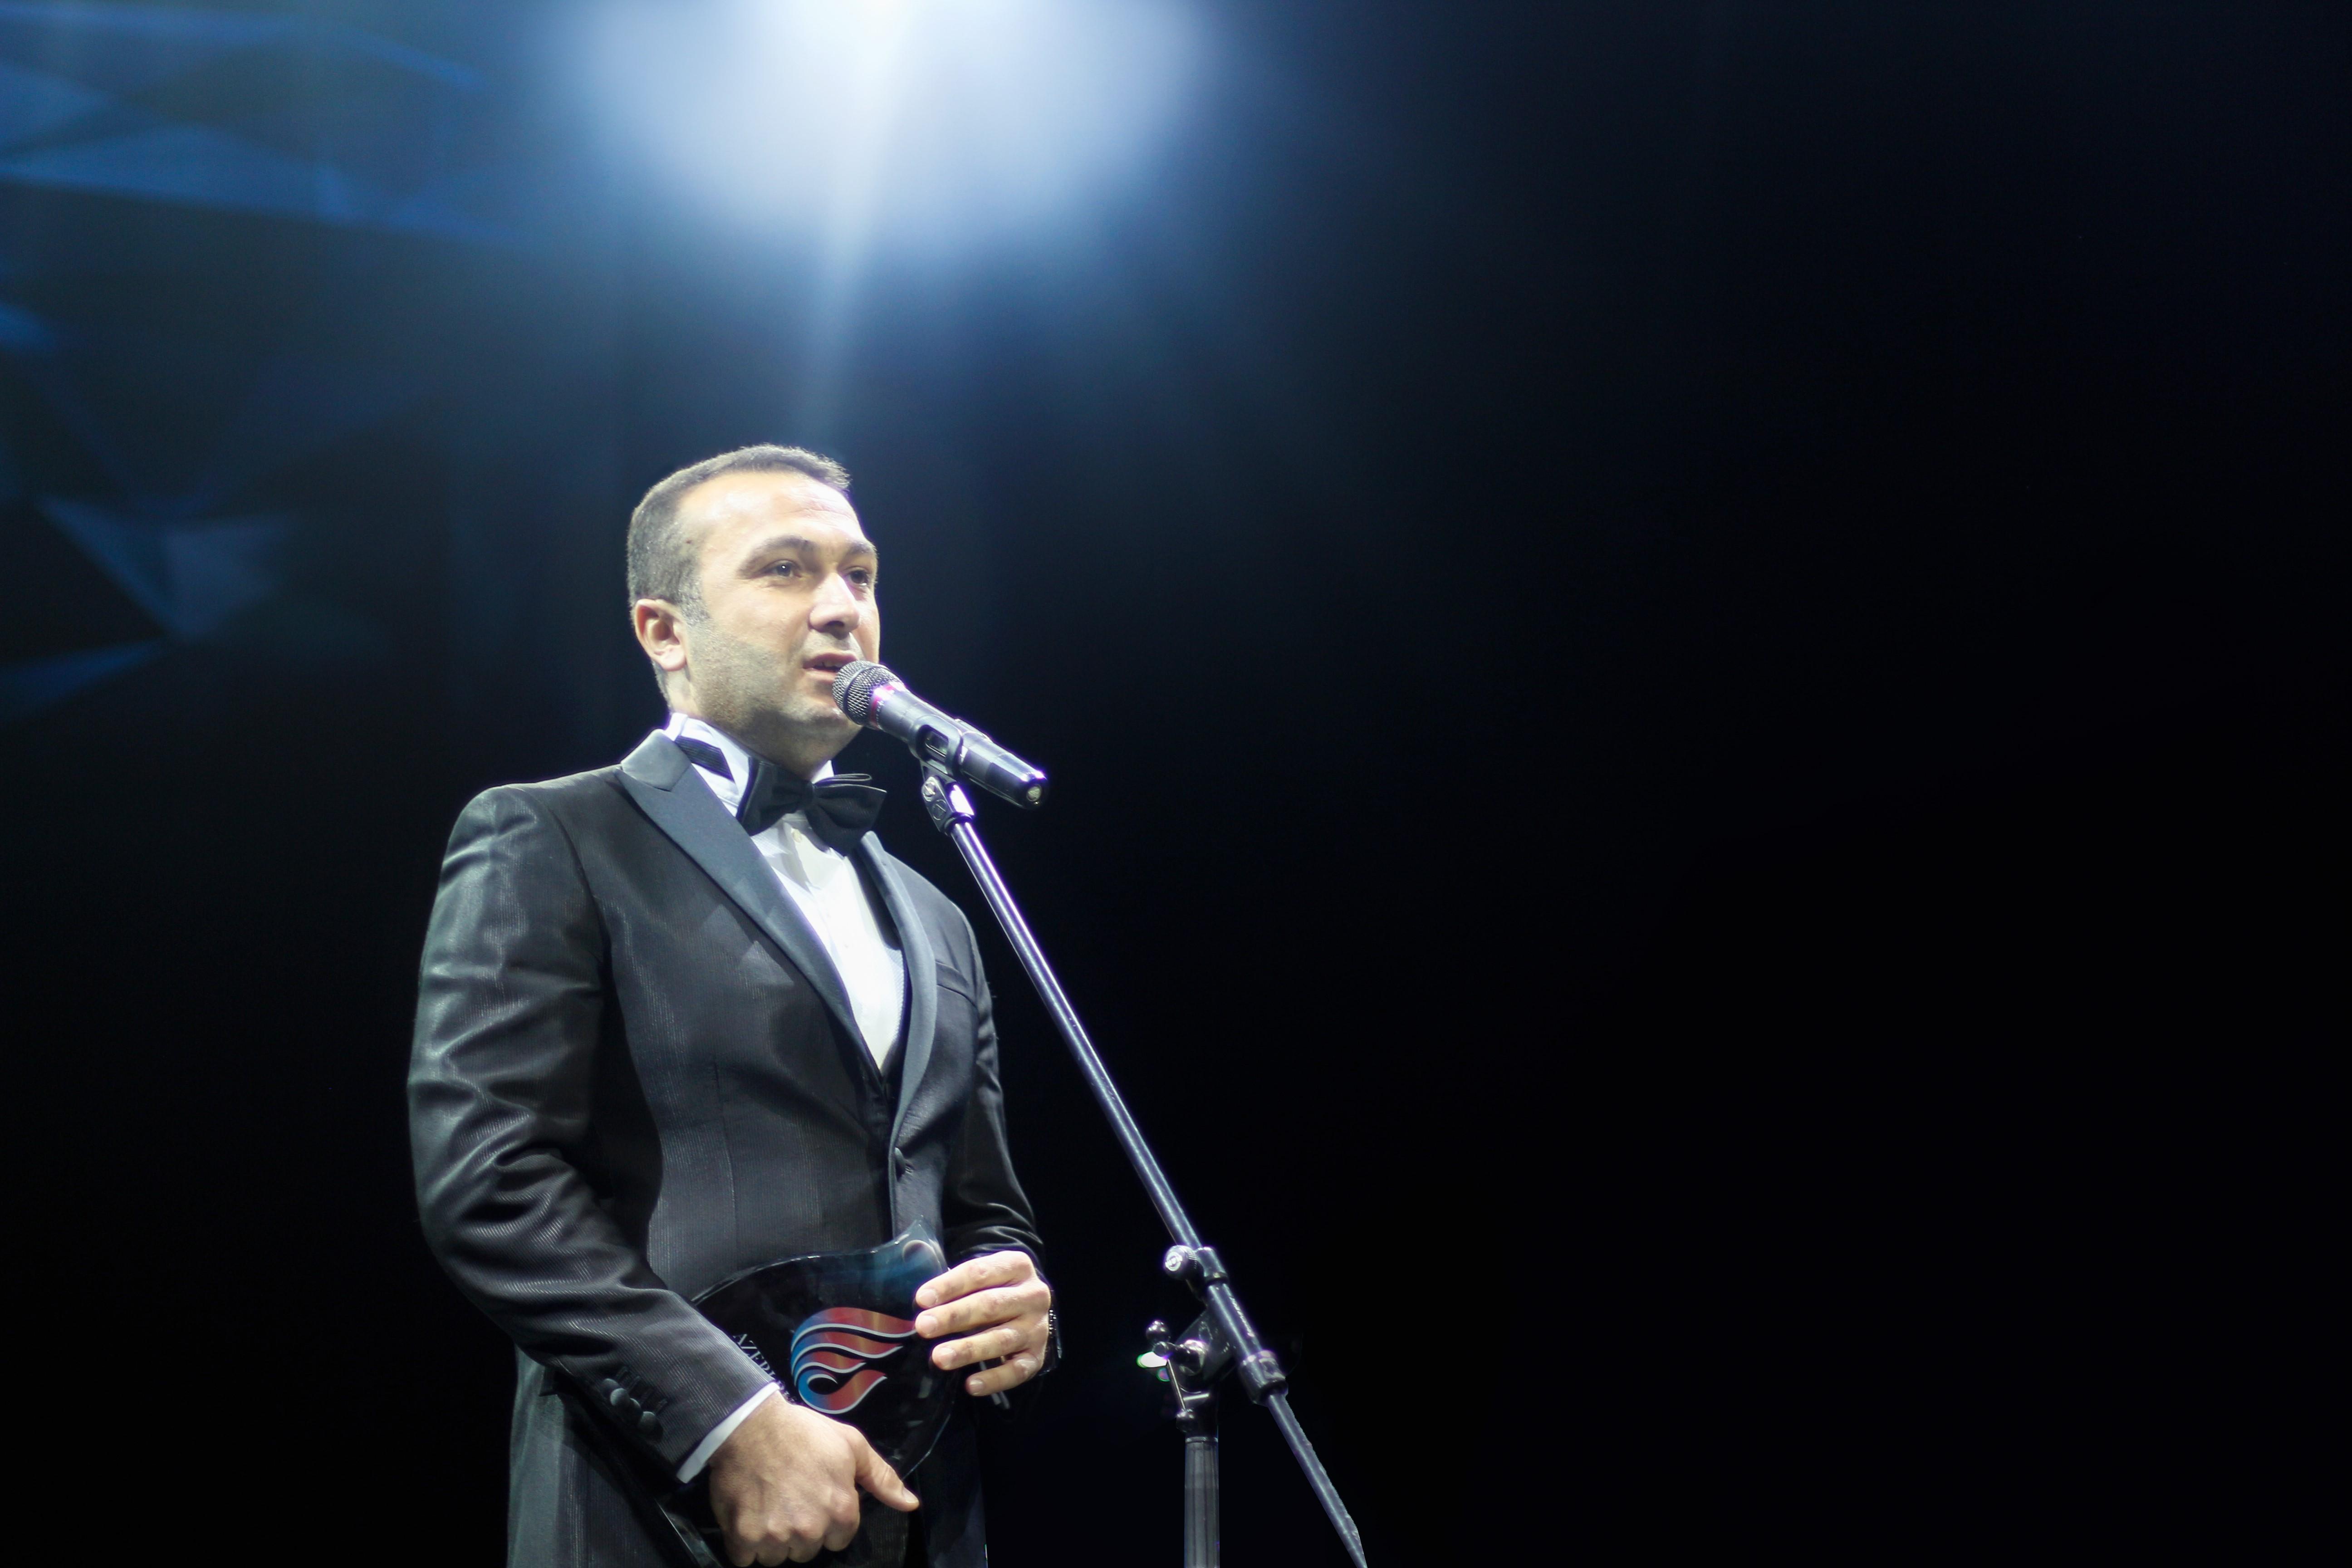 Qardashlar mebel set a goal to bring Azerbaijan furniture to the international market